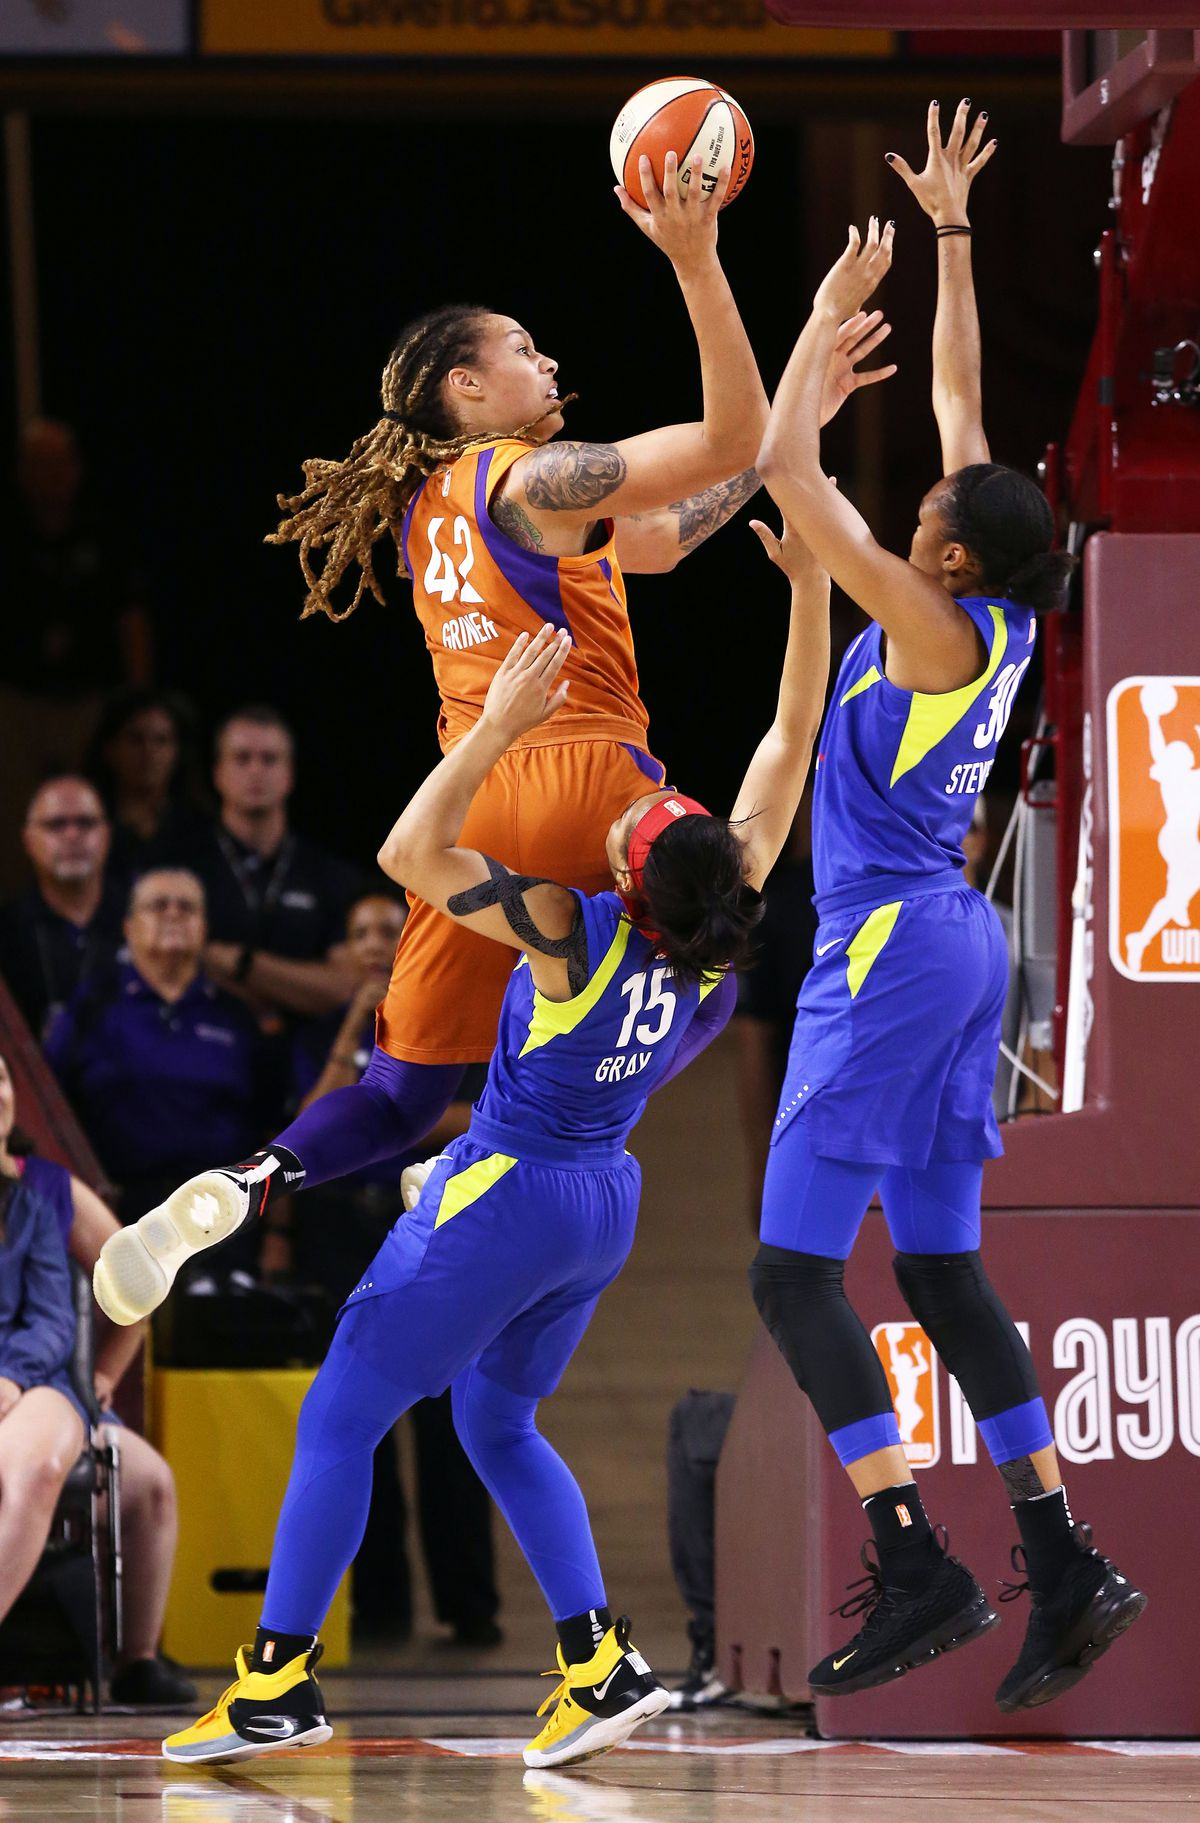 WNBA: Dallas Wings at Phoenix Mercury